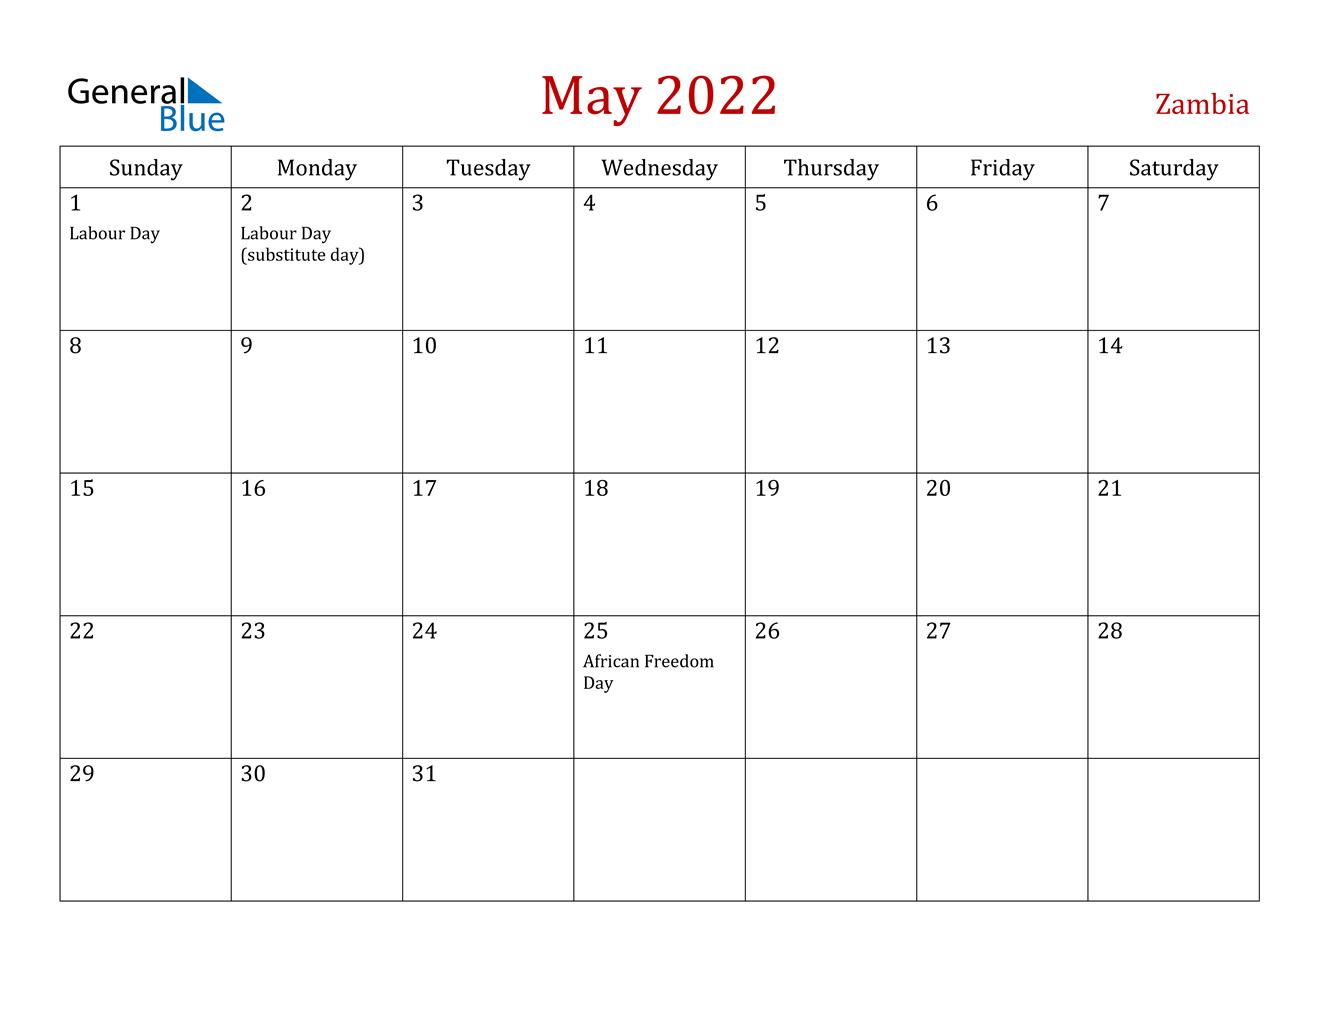 May 2022 Calendar - Zambia regarding March April May 2022 Calendar Printable Graphics